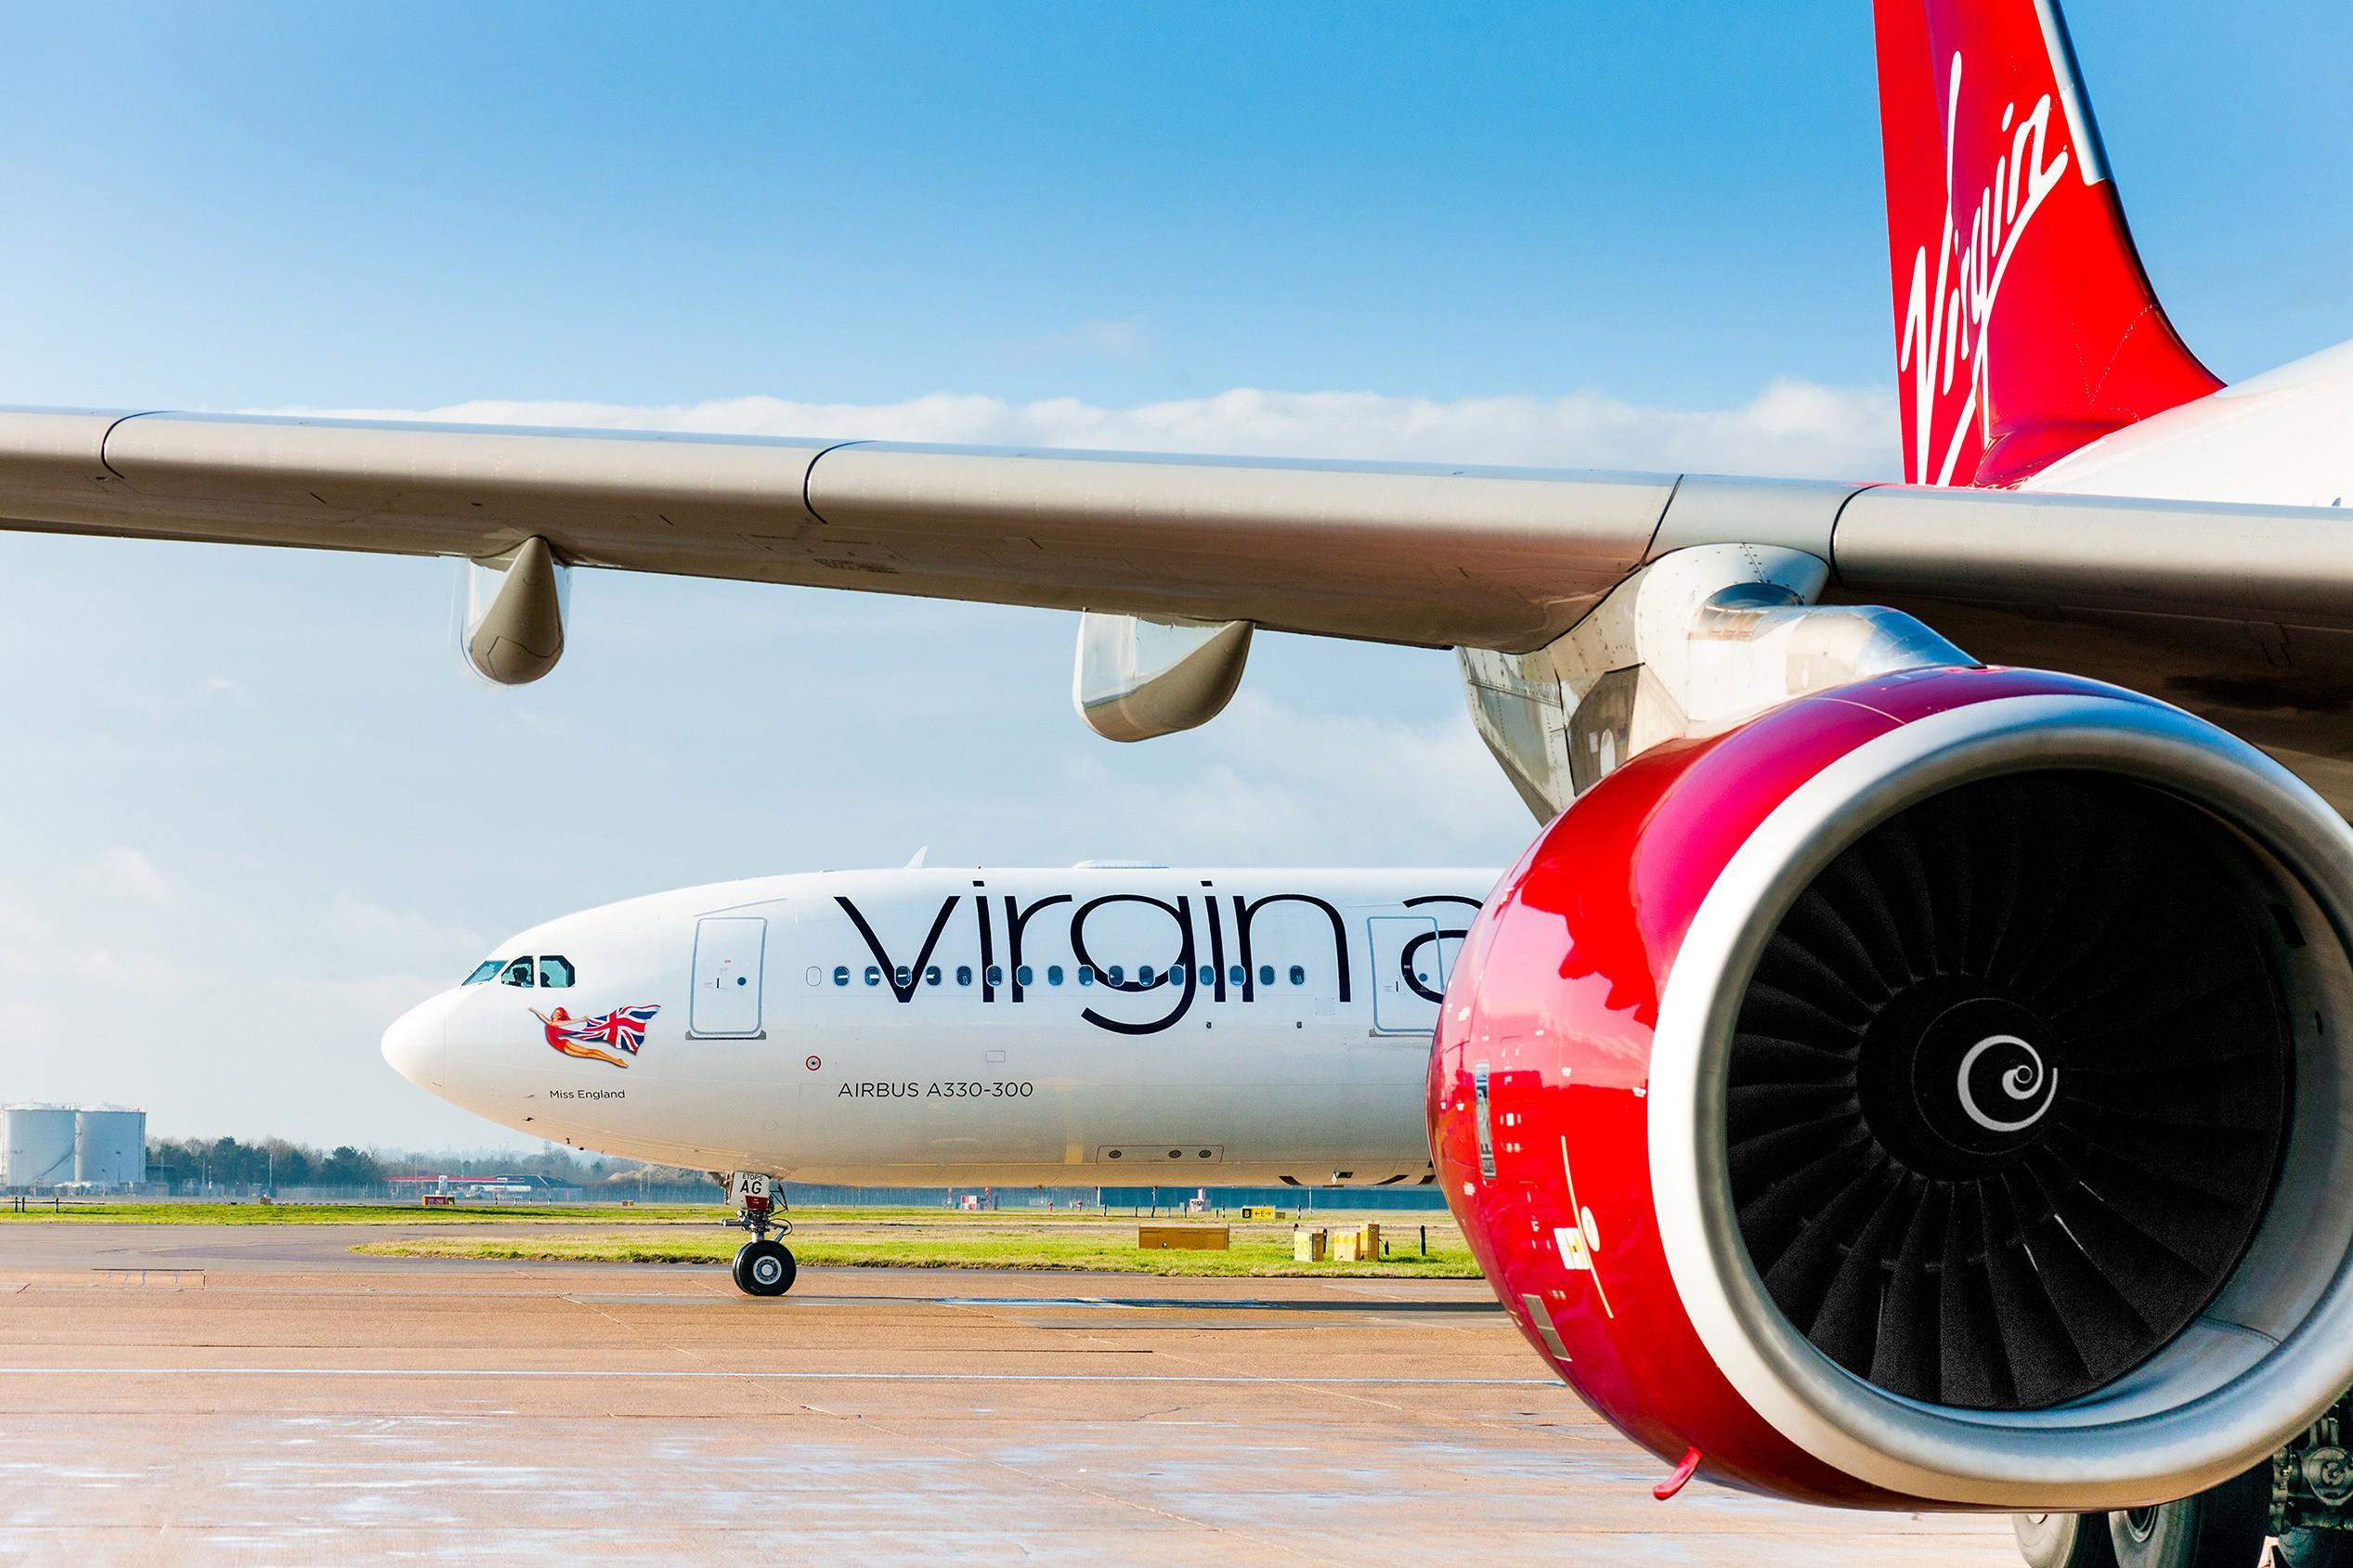 Virgin Atlantic | LinkedIn